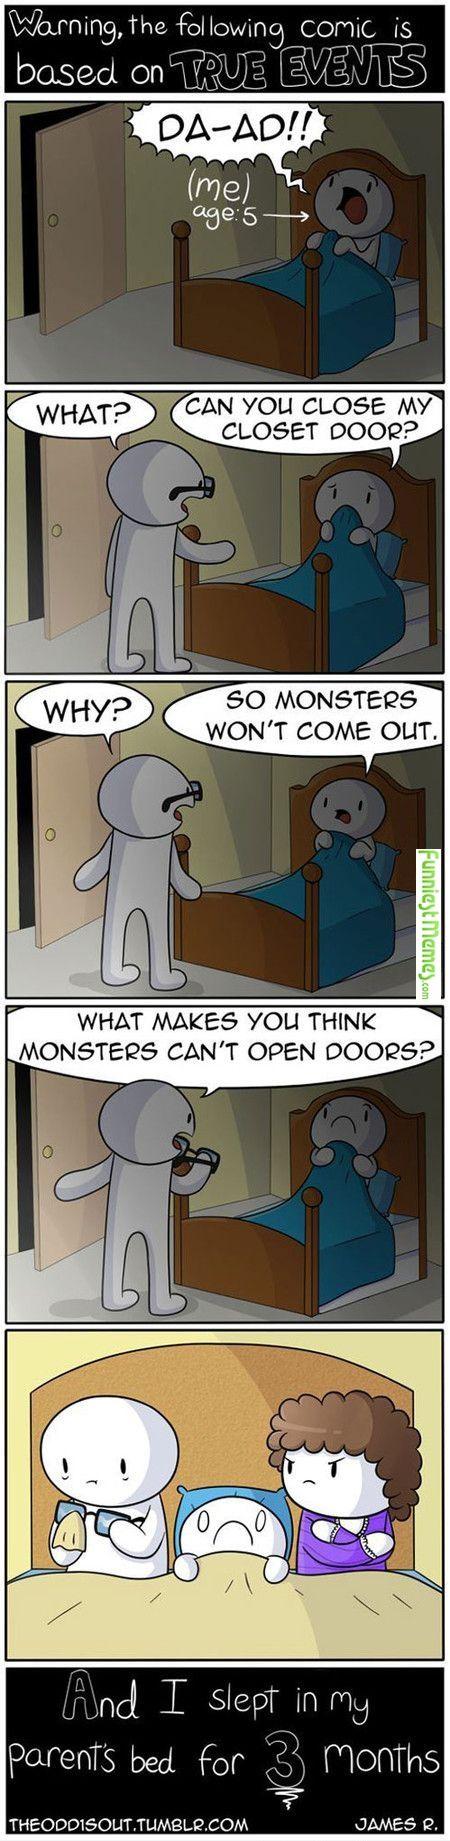 Funny Memes - http://ibeebz.com